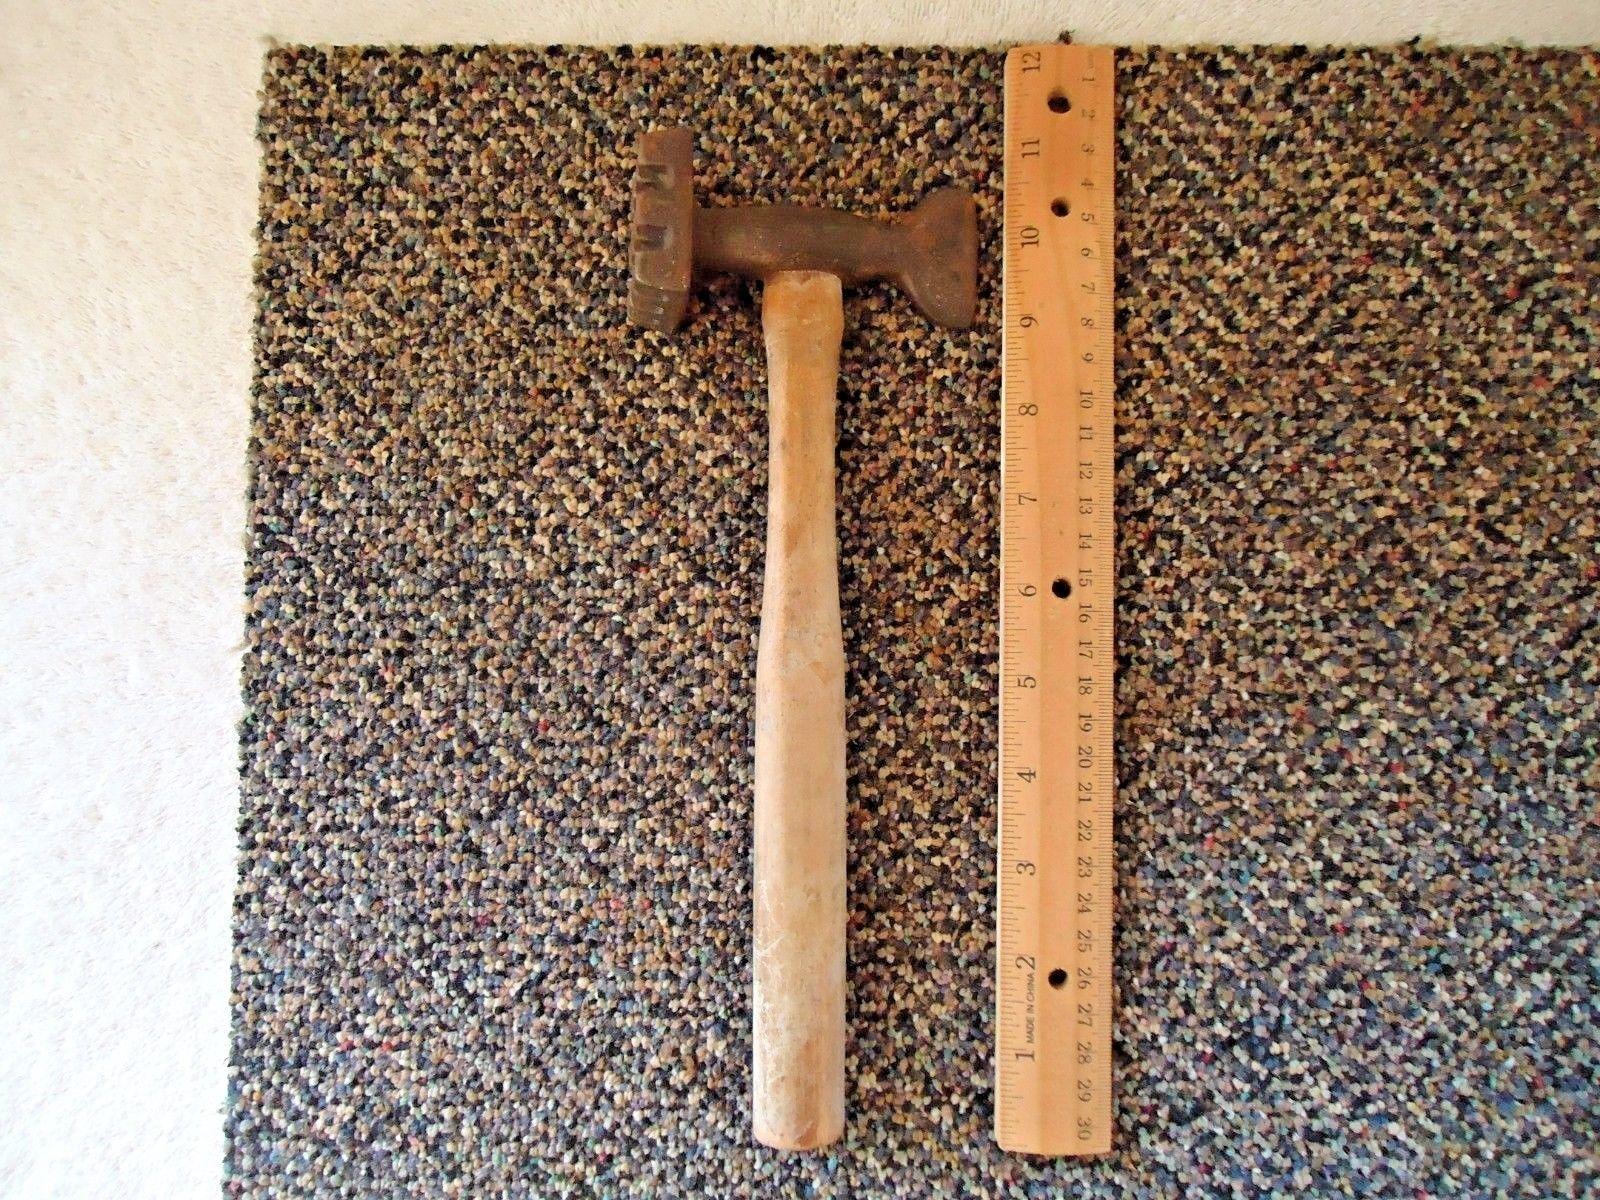 Vintage Wooden Handle Metal Meat Tenderizer And 50 Similar Items